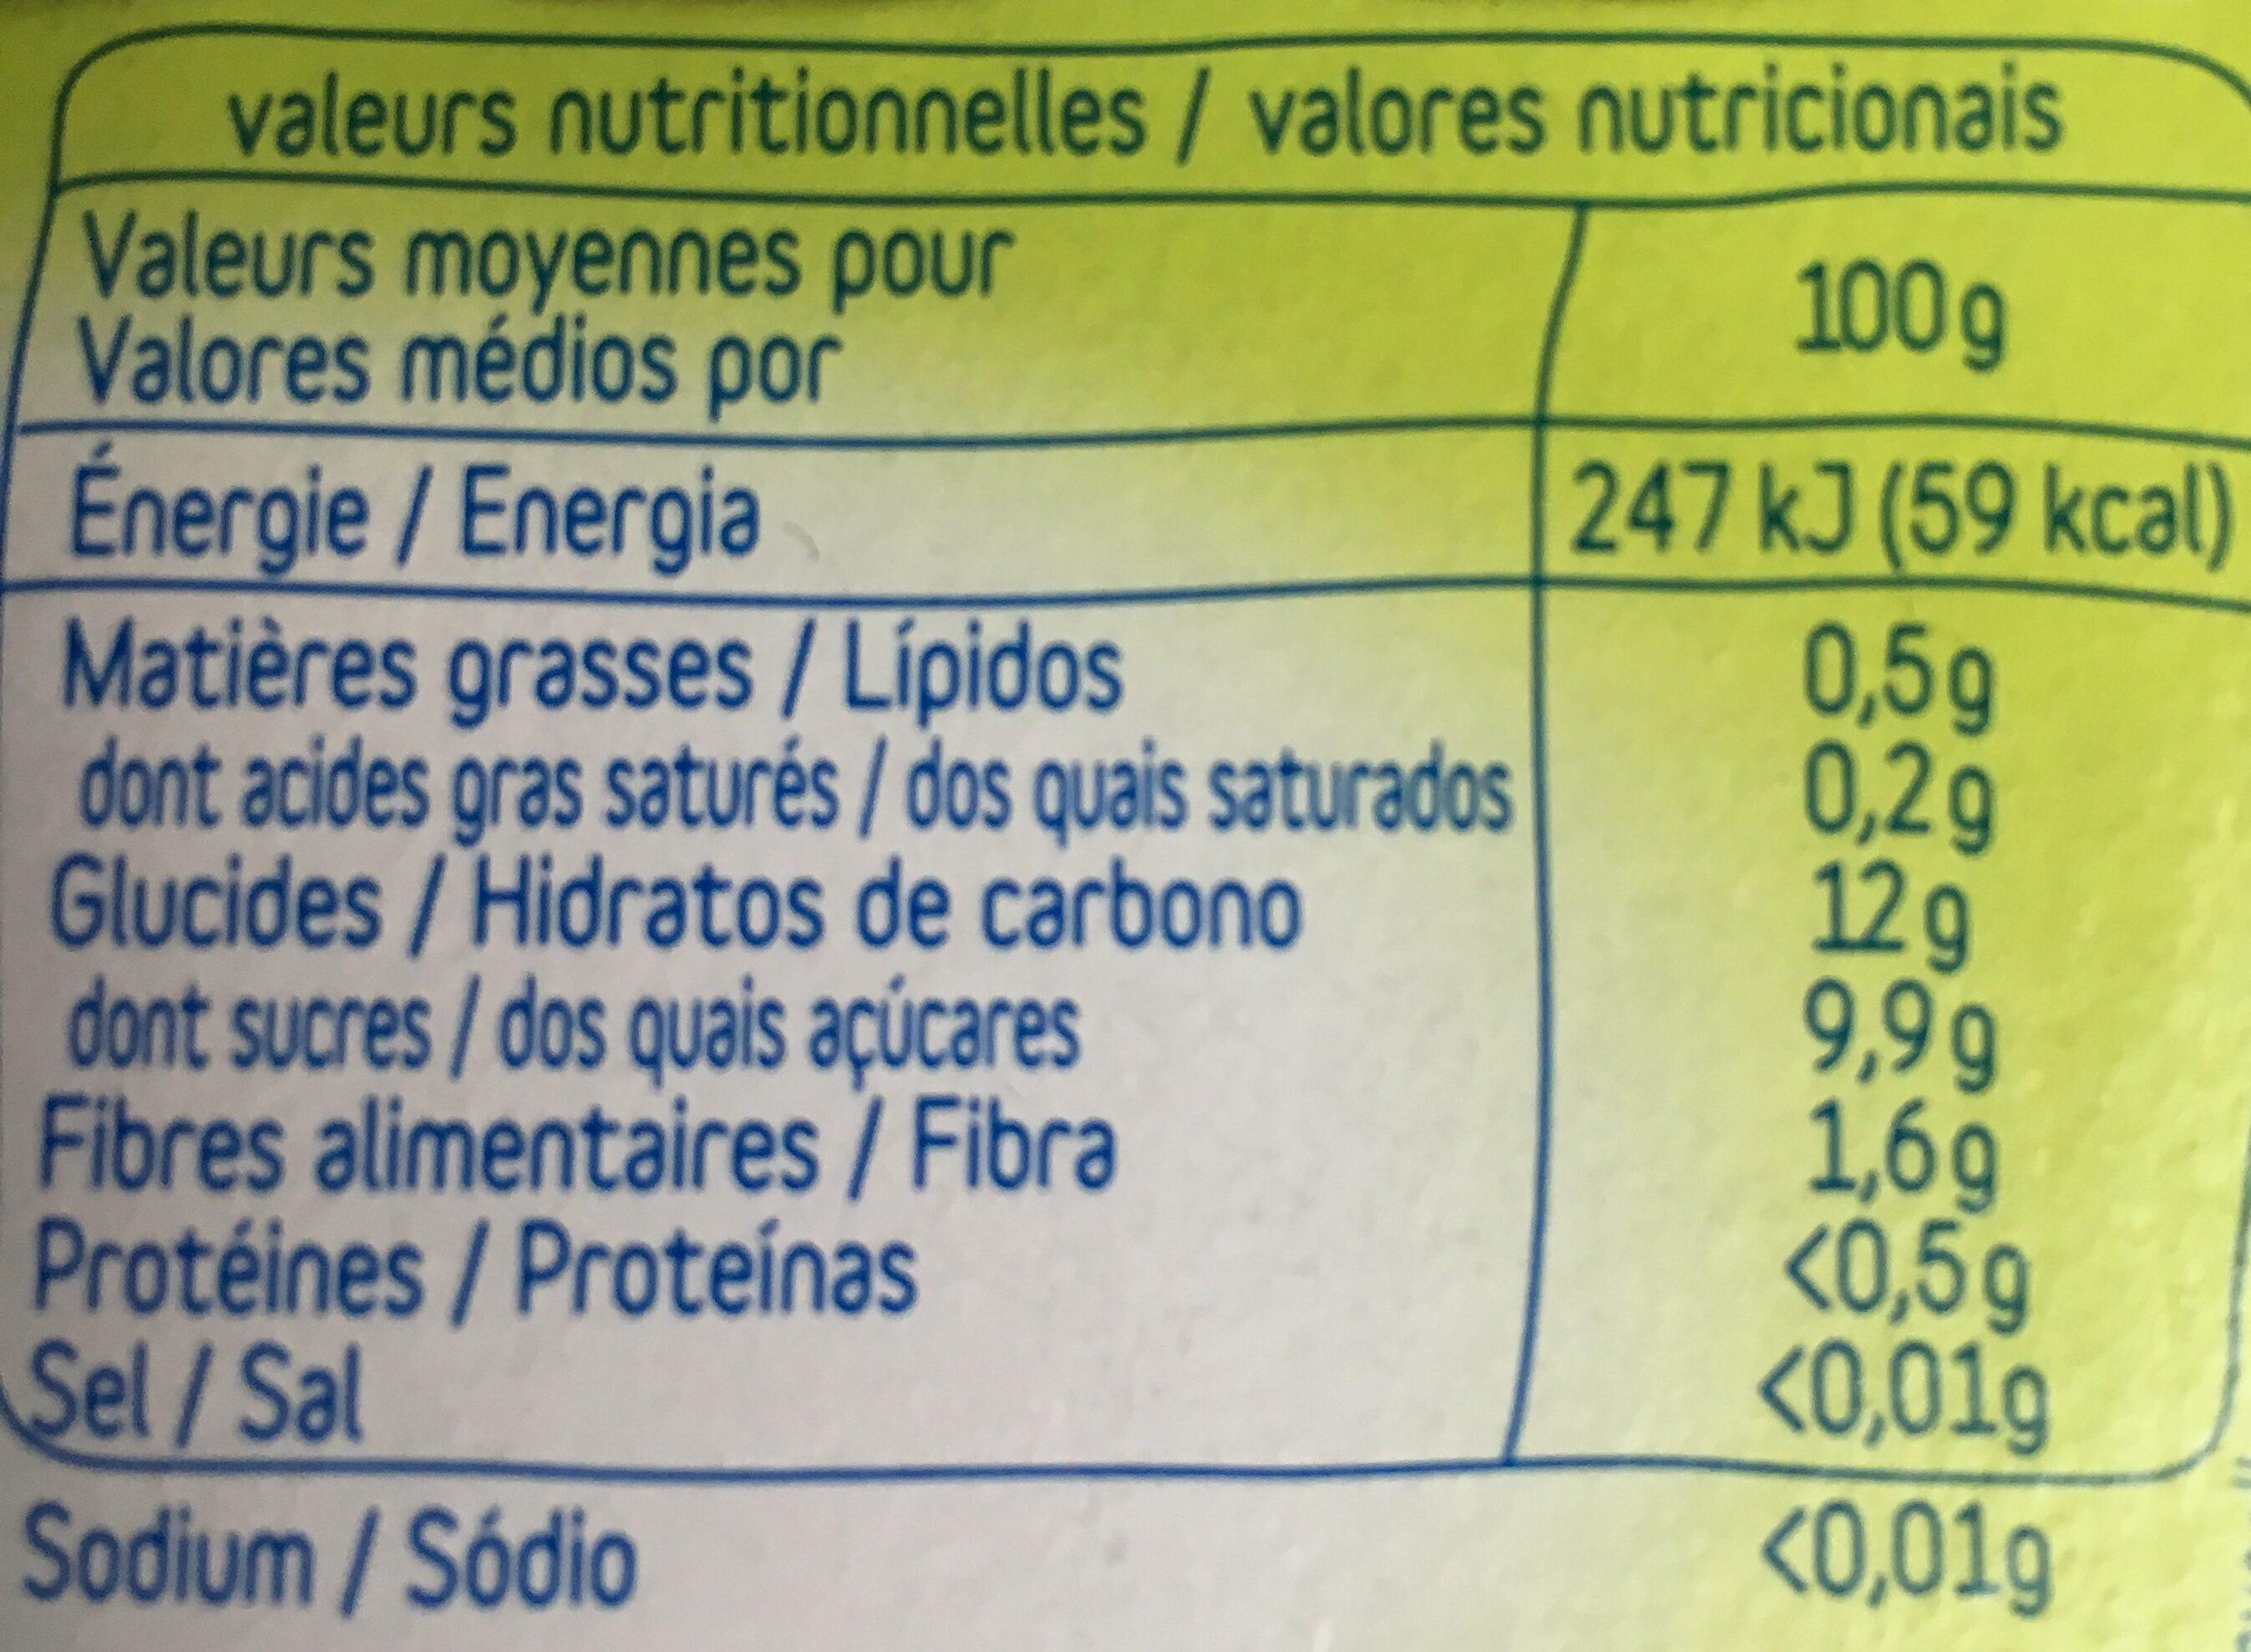 Baby coupelles pomme coing banane des 4 mois - Informations nutritionnelles - fr